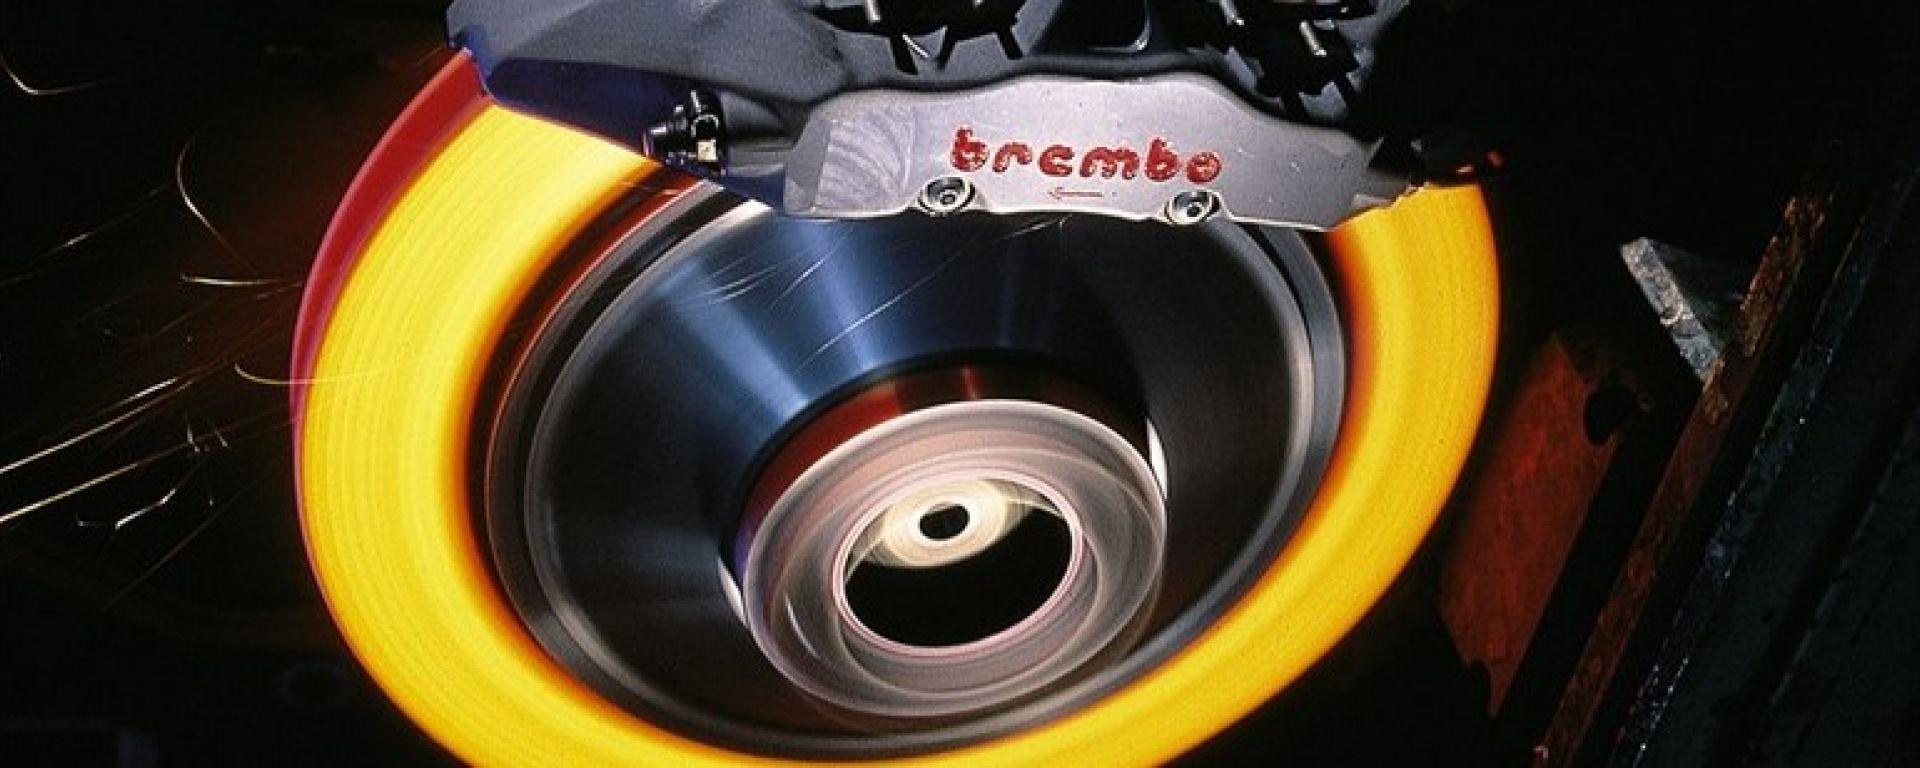 Freni Brembo F1 2017